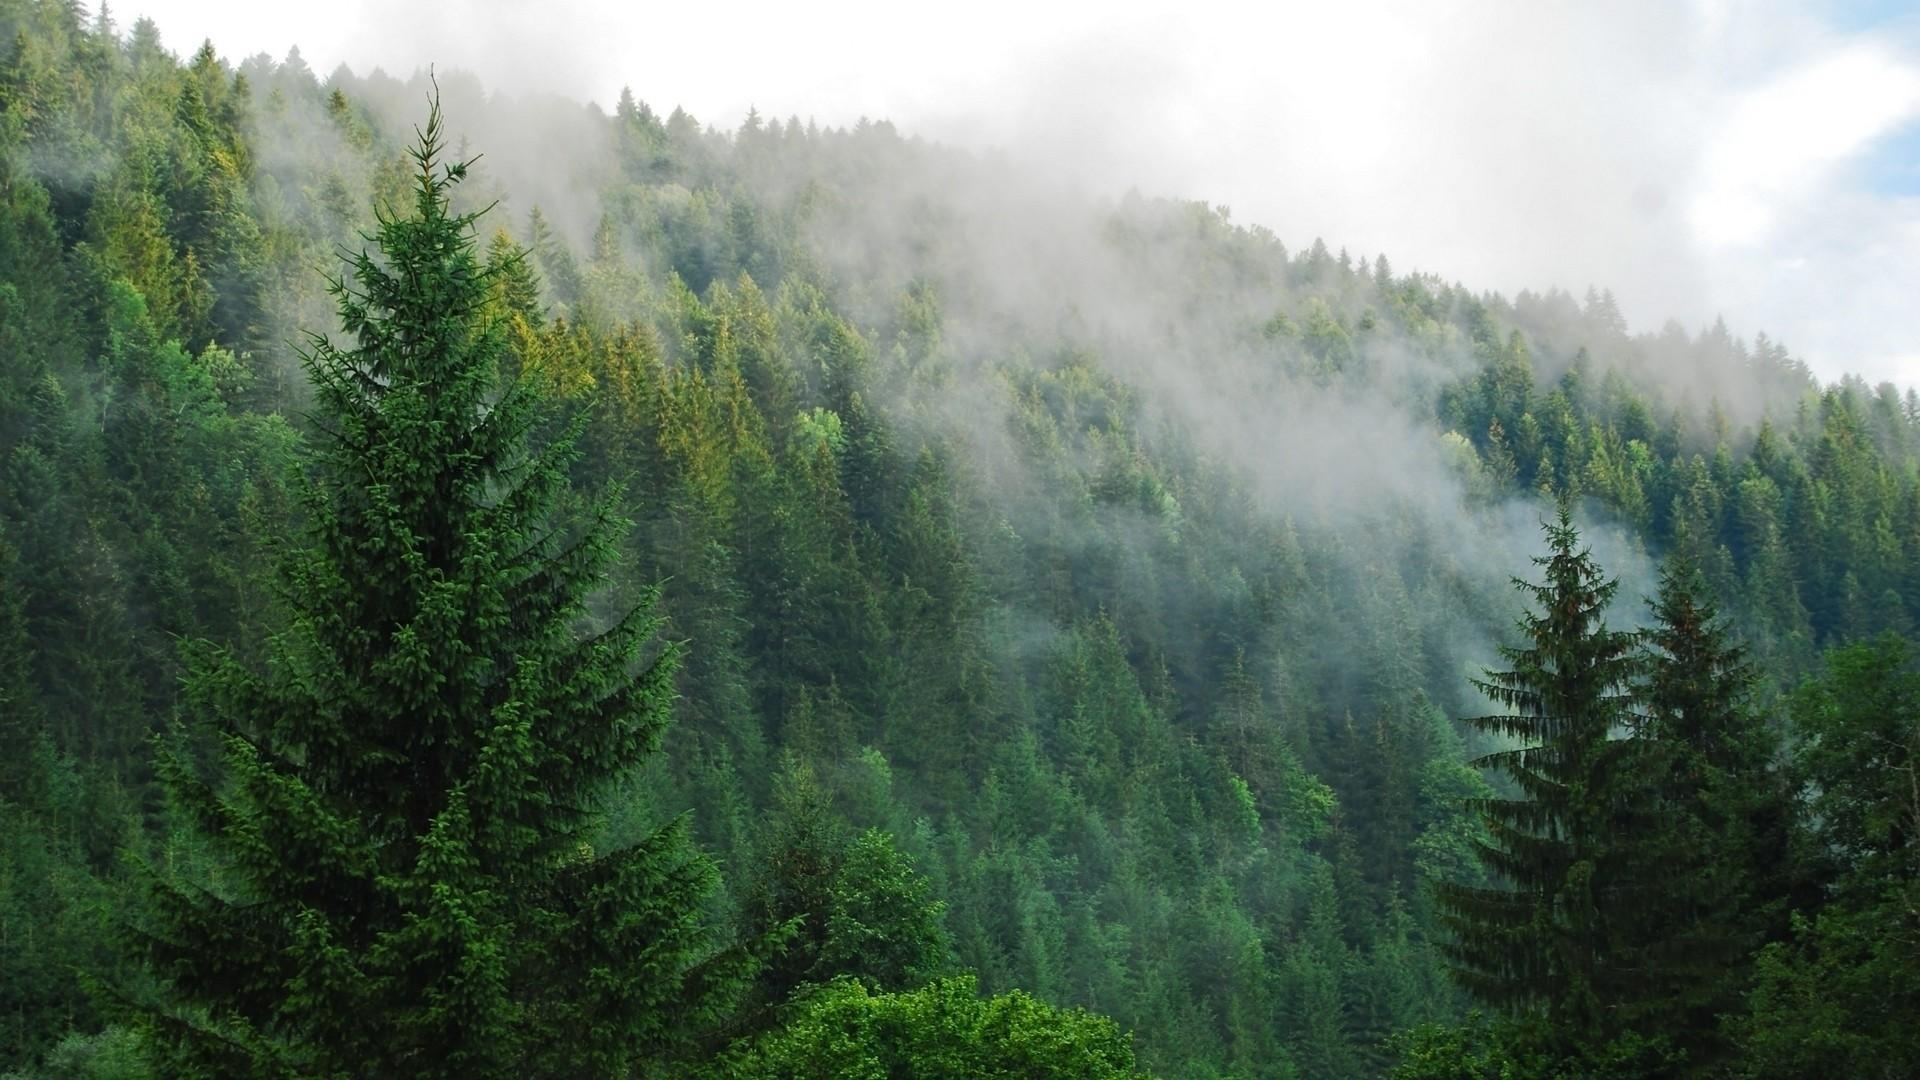 Foggy Pine Forest Wallpaper Downloads - Pine Forest Wallpaper 4k - HD Wallpaper